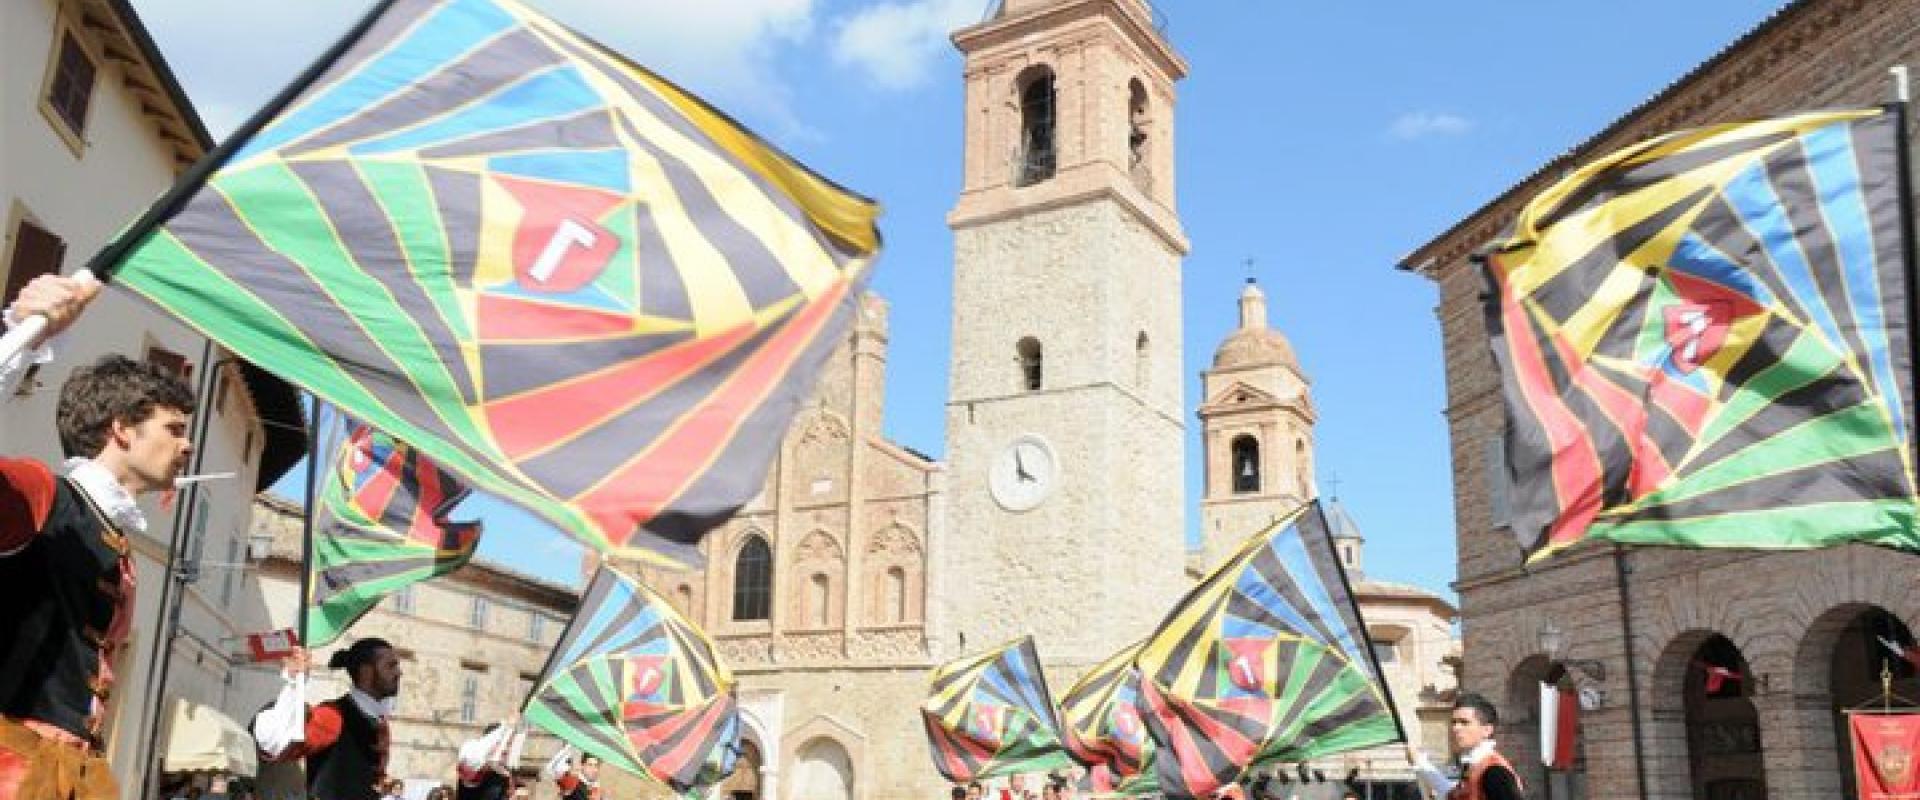 Visit of San Ginesio Marche